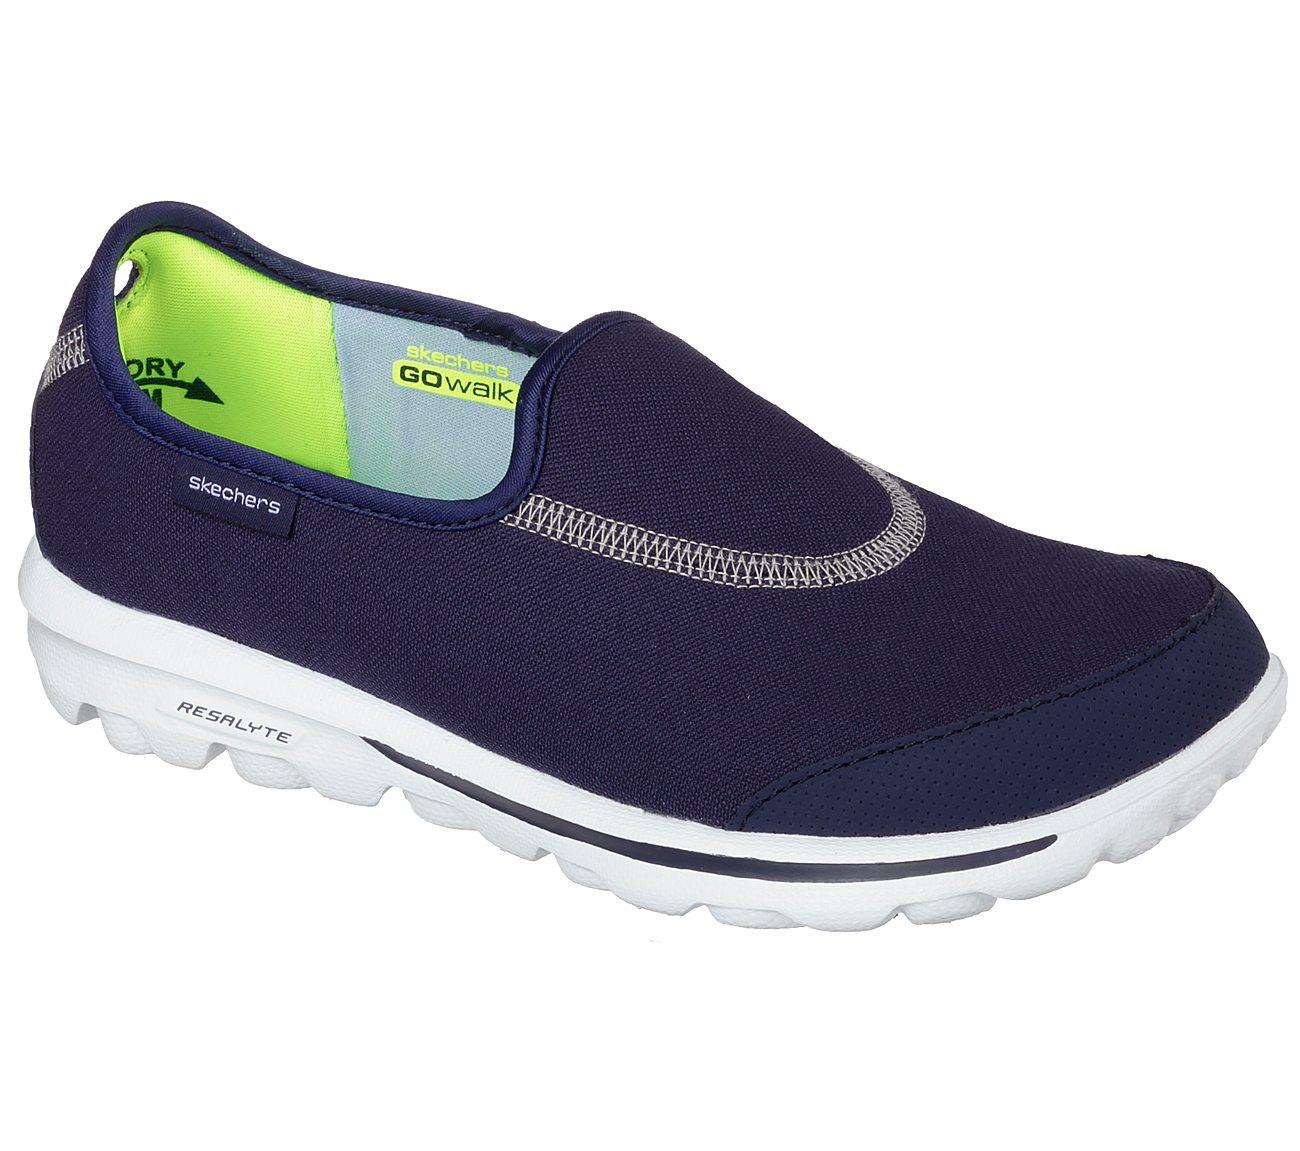 e1501446d251d Buy SKECHERS Skechers GOwalk - Impress On the GO Shoes only $67.00